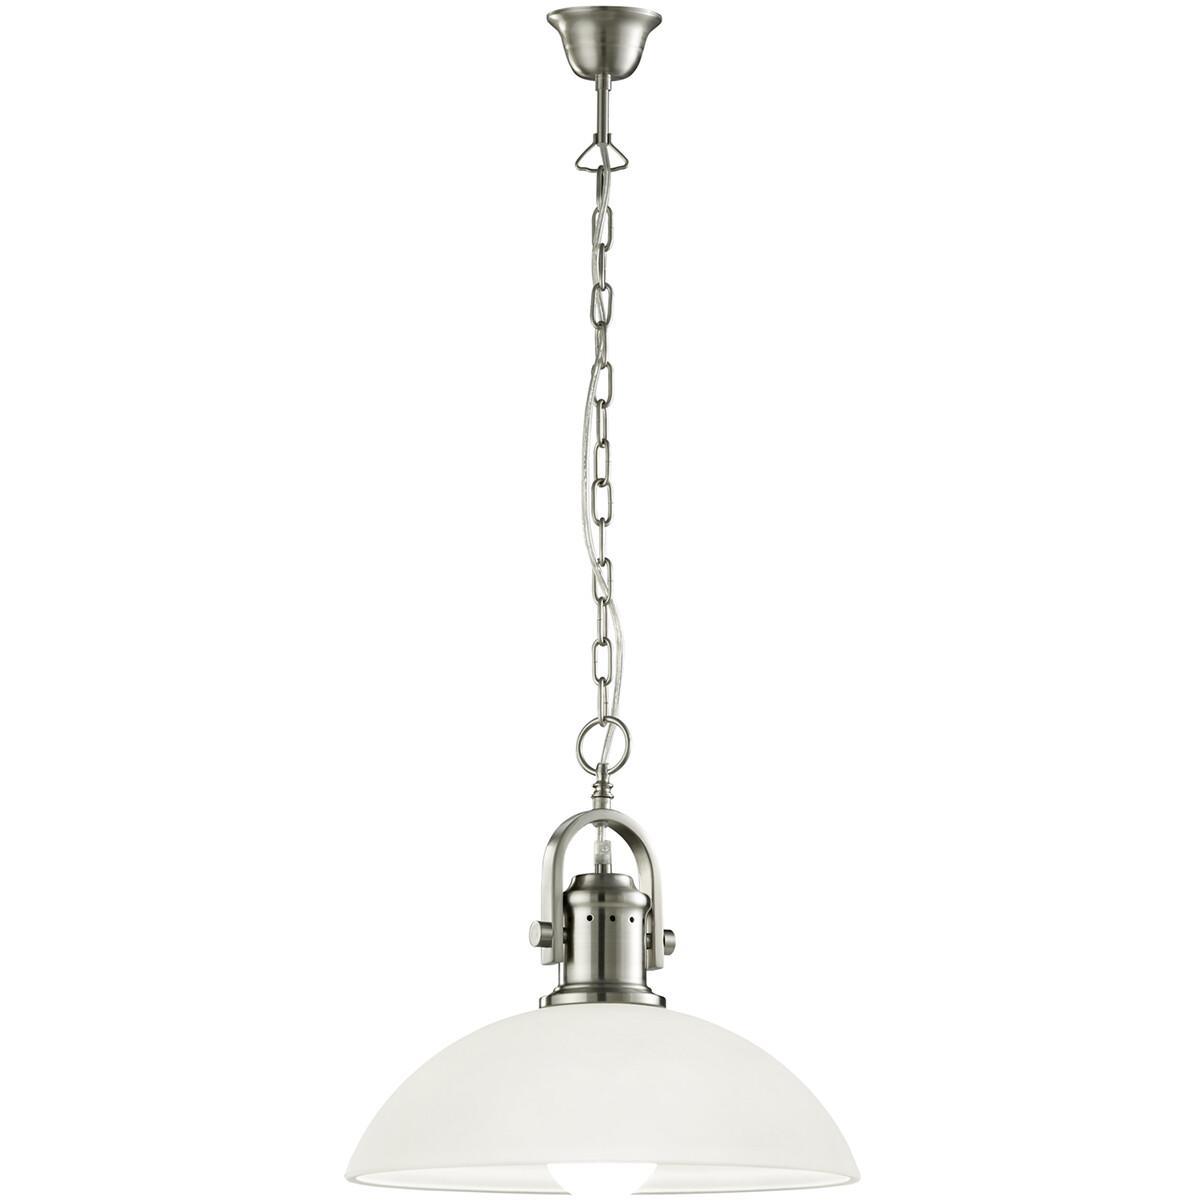 LED Hanglamp - Hangverlichting - Trion Montino - E27 Fitting - Rond - Mat Nikkel - Aluminium